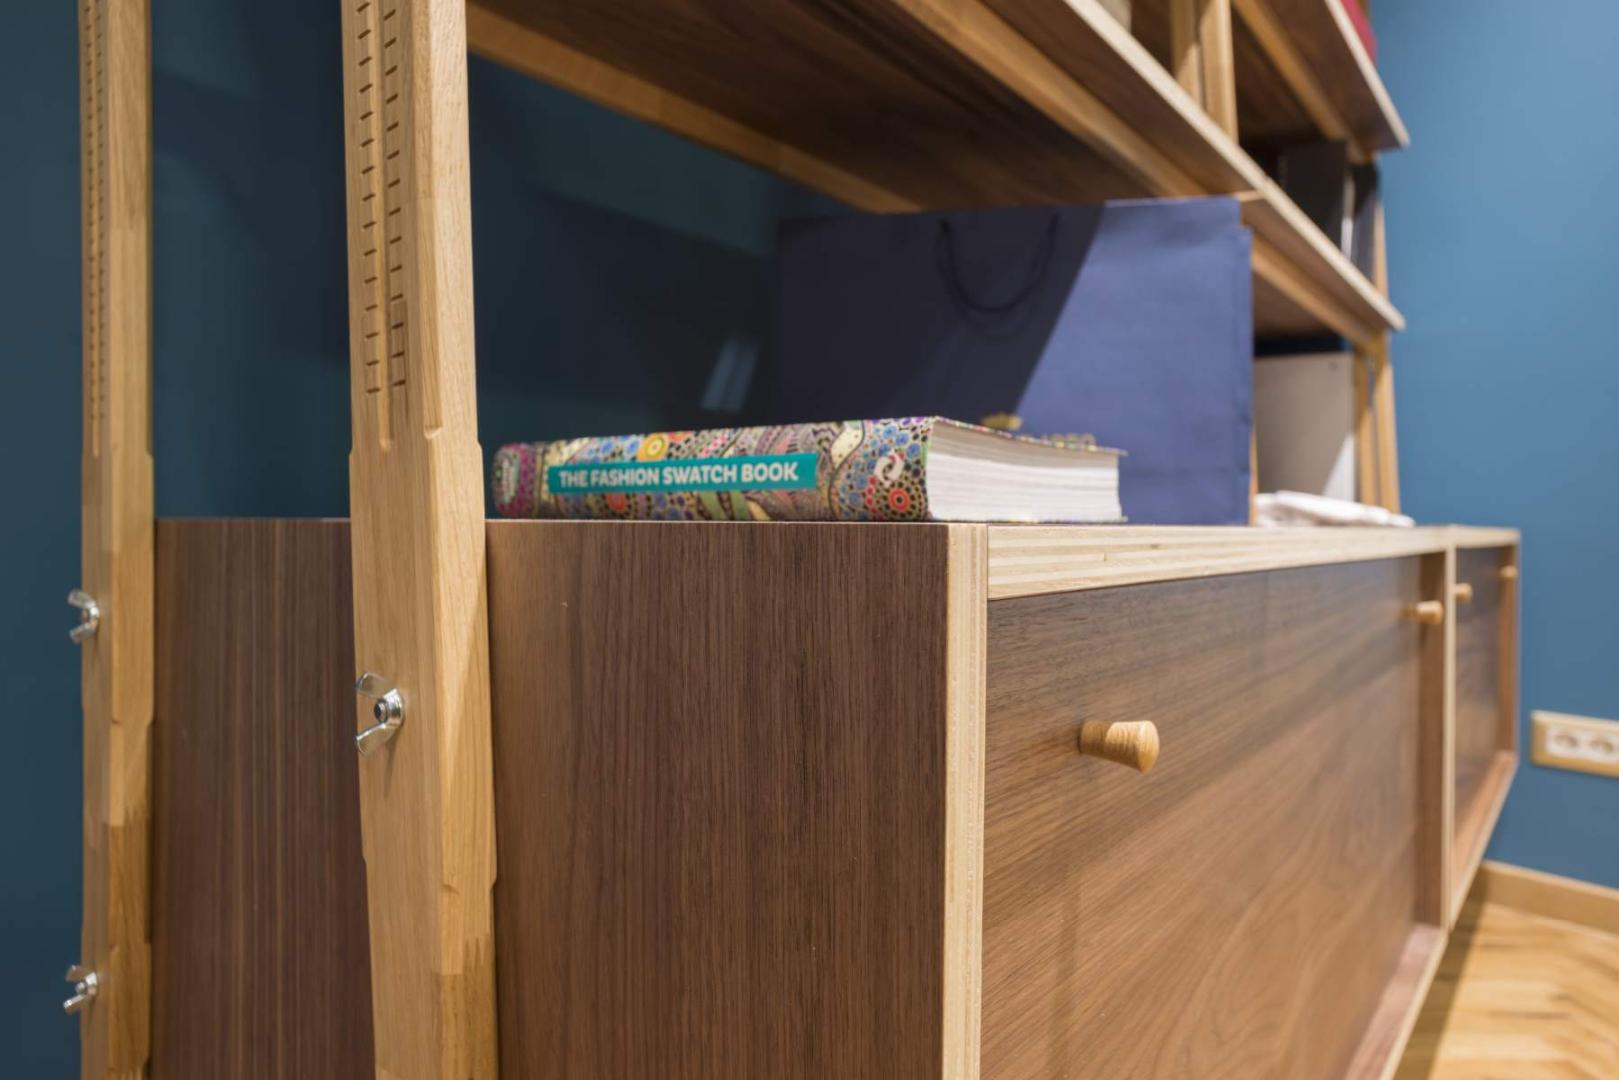 Braiconf magazin shop marriott mobilier lemn masiv furnir design dinamic015